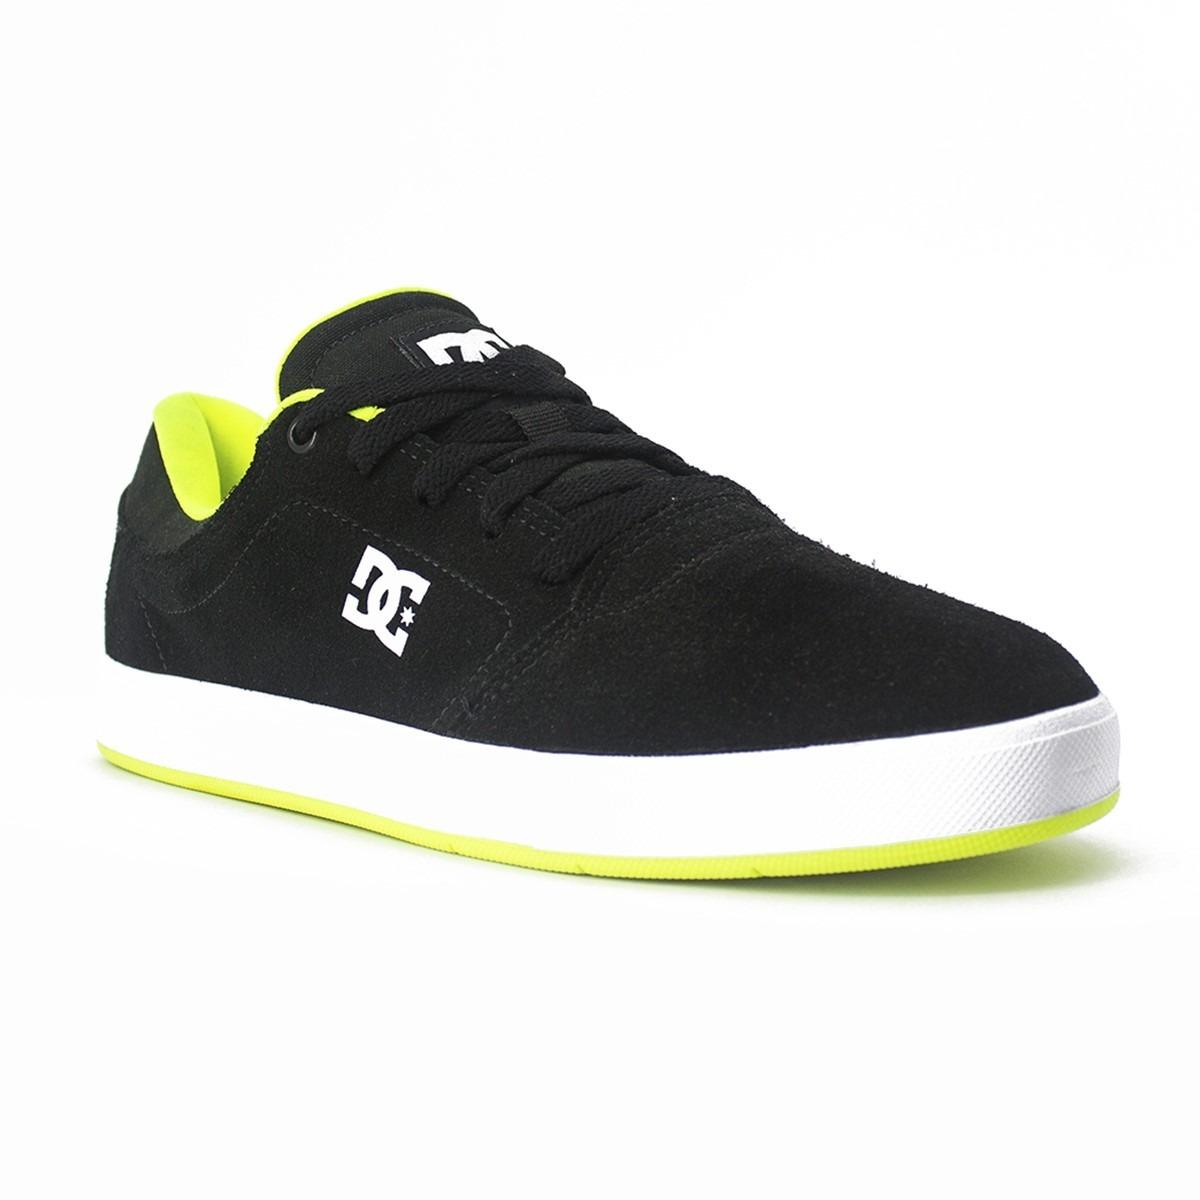 tenis dc shoes crisis la black lime original frete gratis. Carregando zoom. 07b6fad13acce